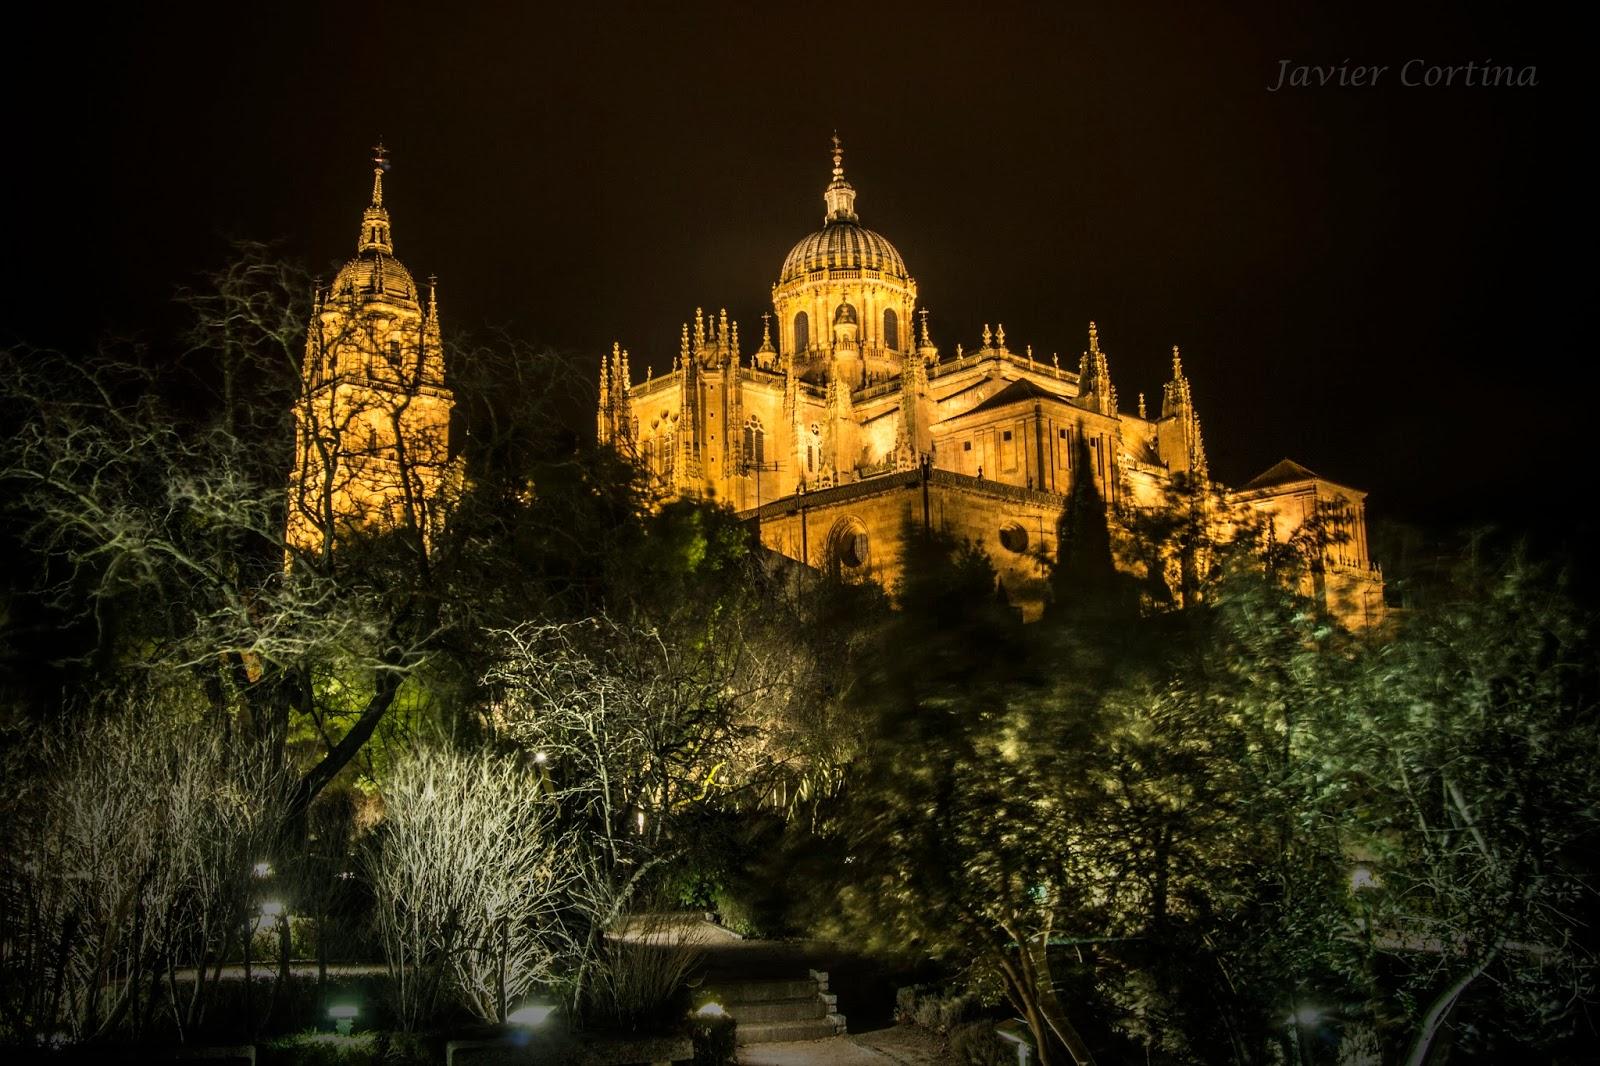 Blog de fotograf a de javier cortina fern ndez salamanca por la noche salamanca at night - Jardin de calisto y melibea salamanca ...